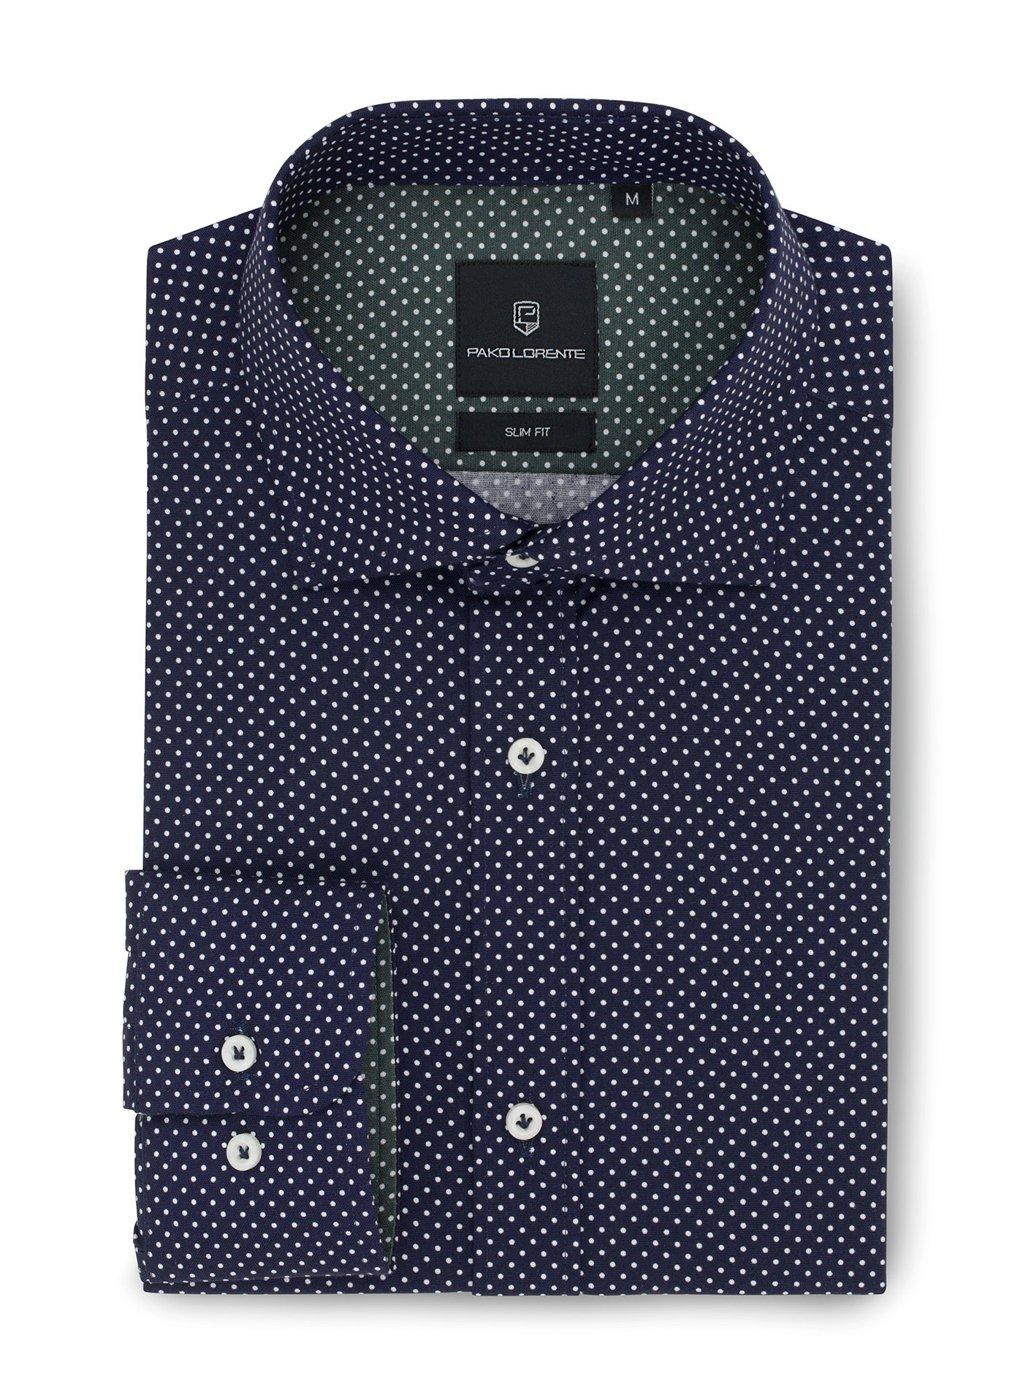 Koszula męska GAMBLER PLM-1X-326-G